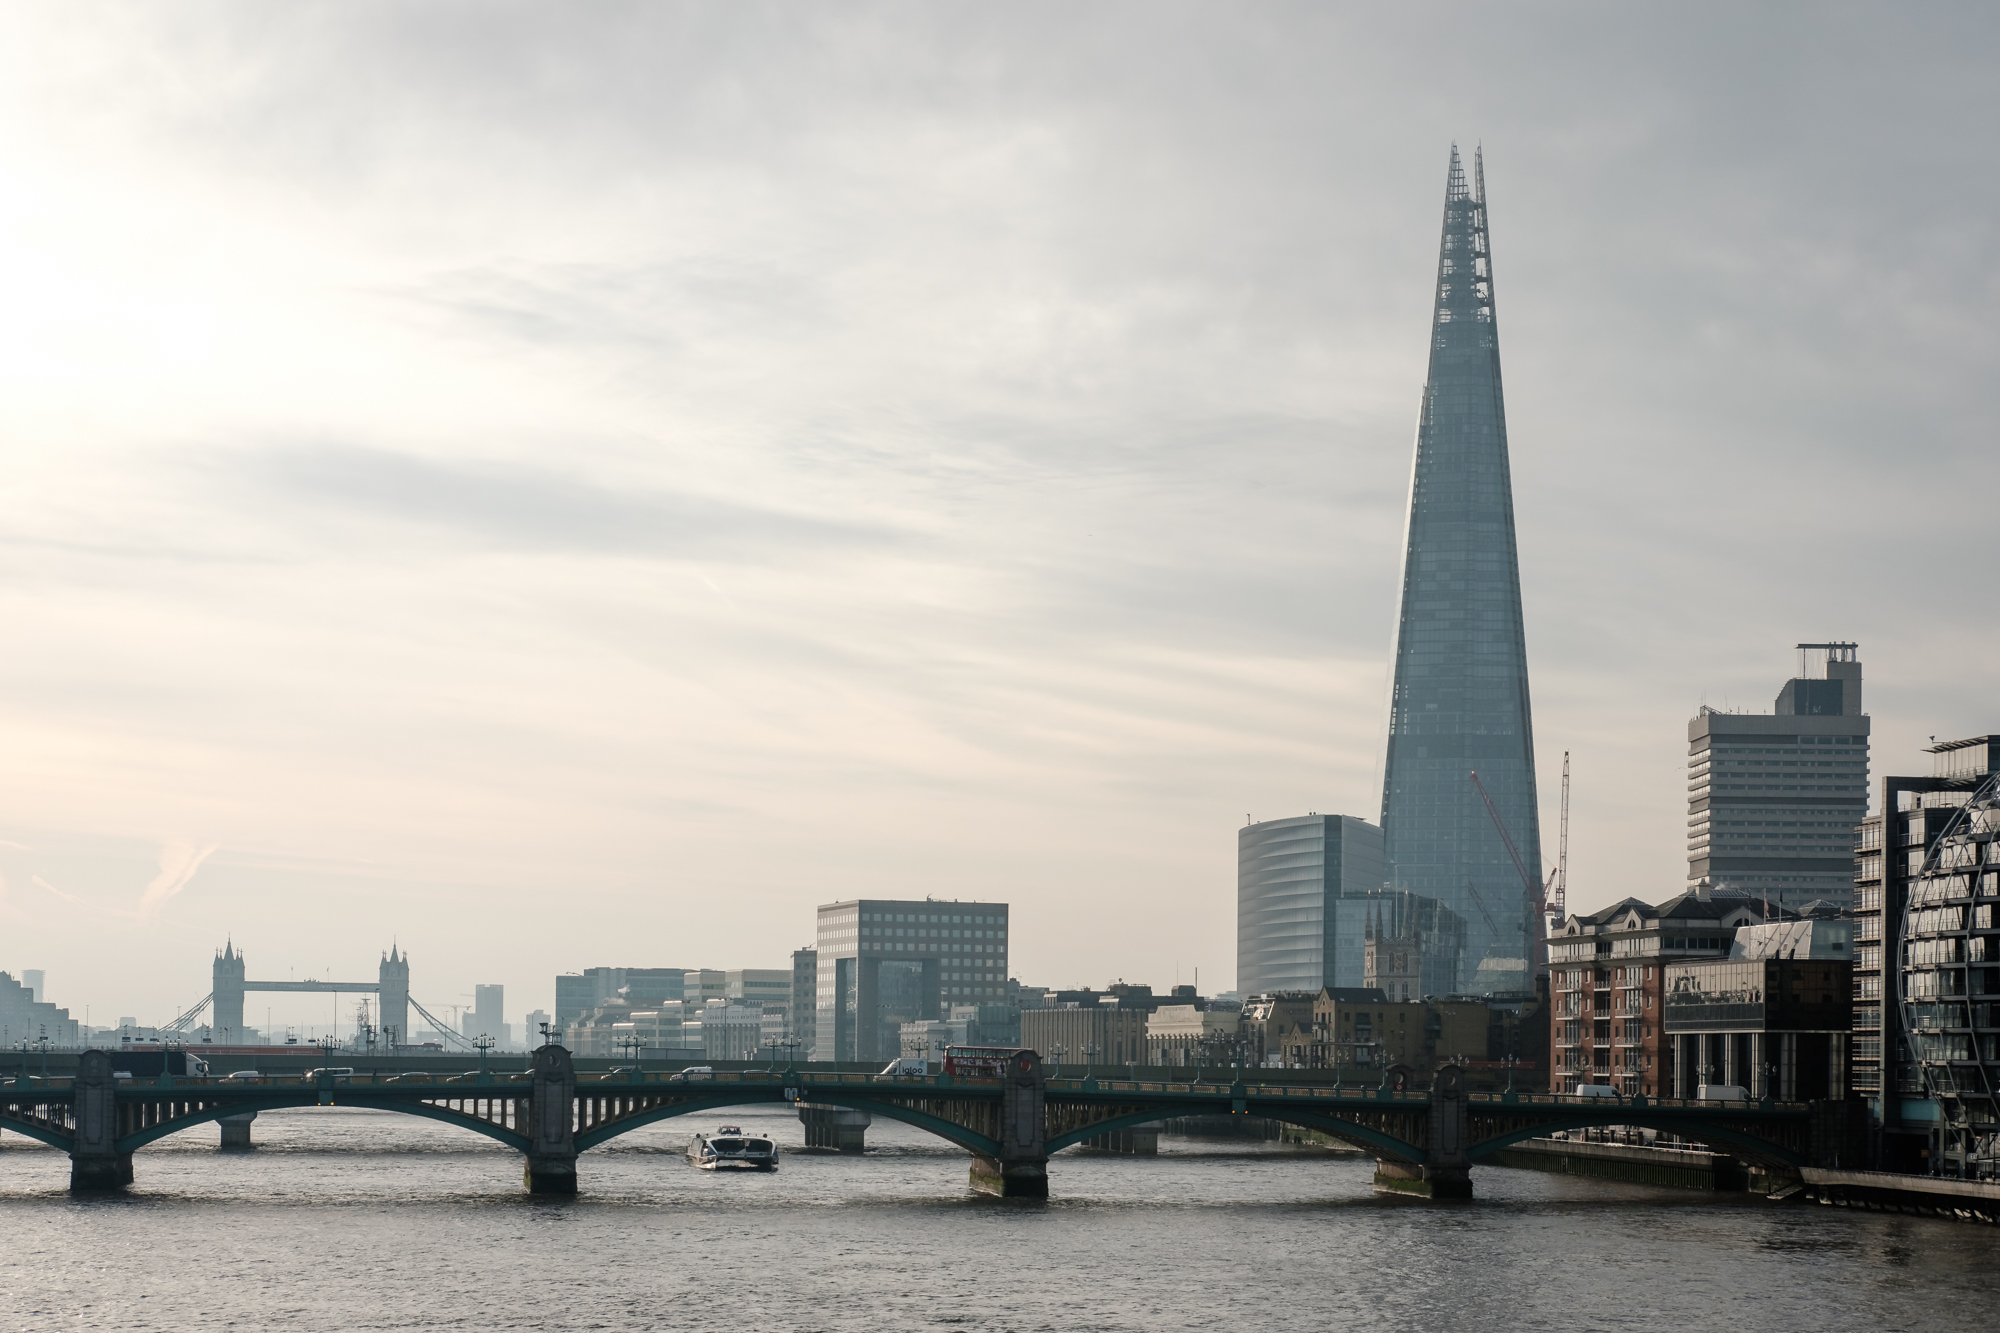 London Chrome photo of The Shard taken by Trevor Sherwin